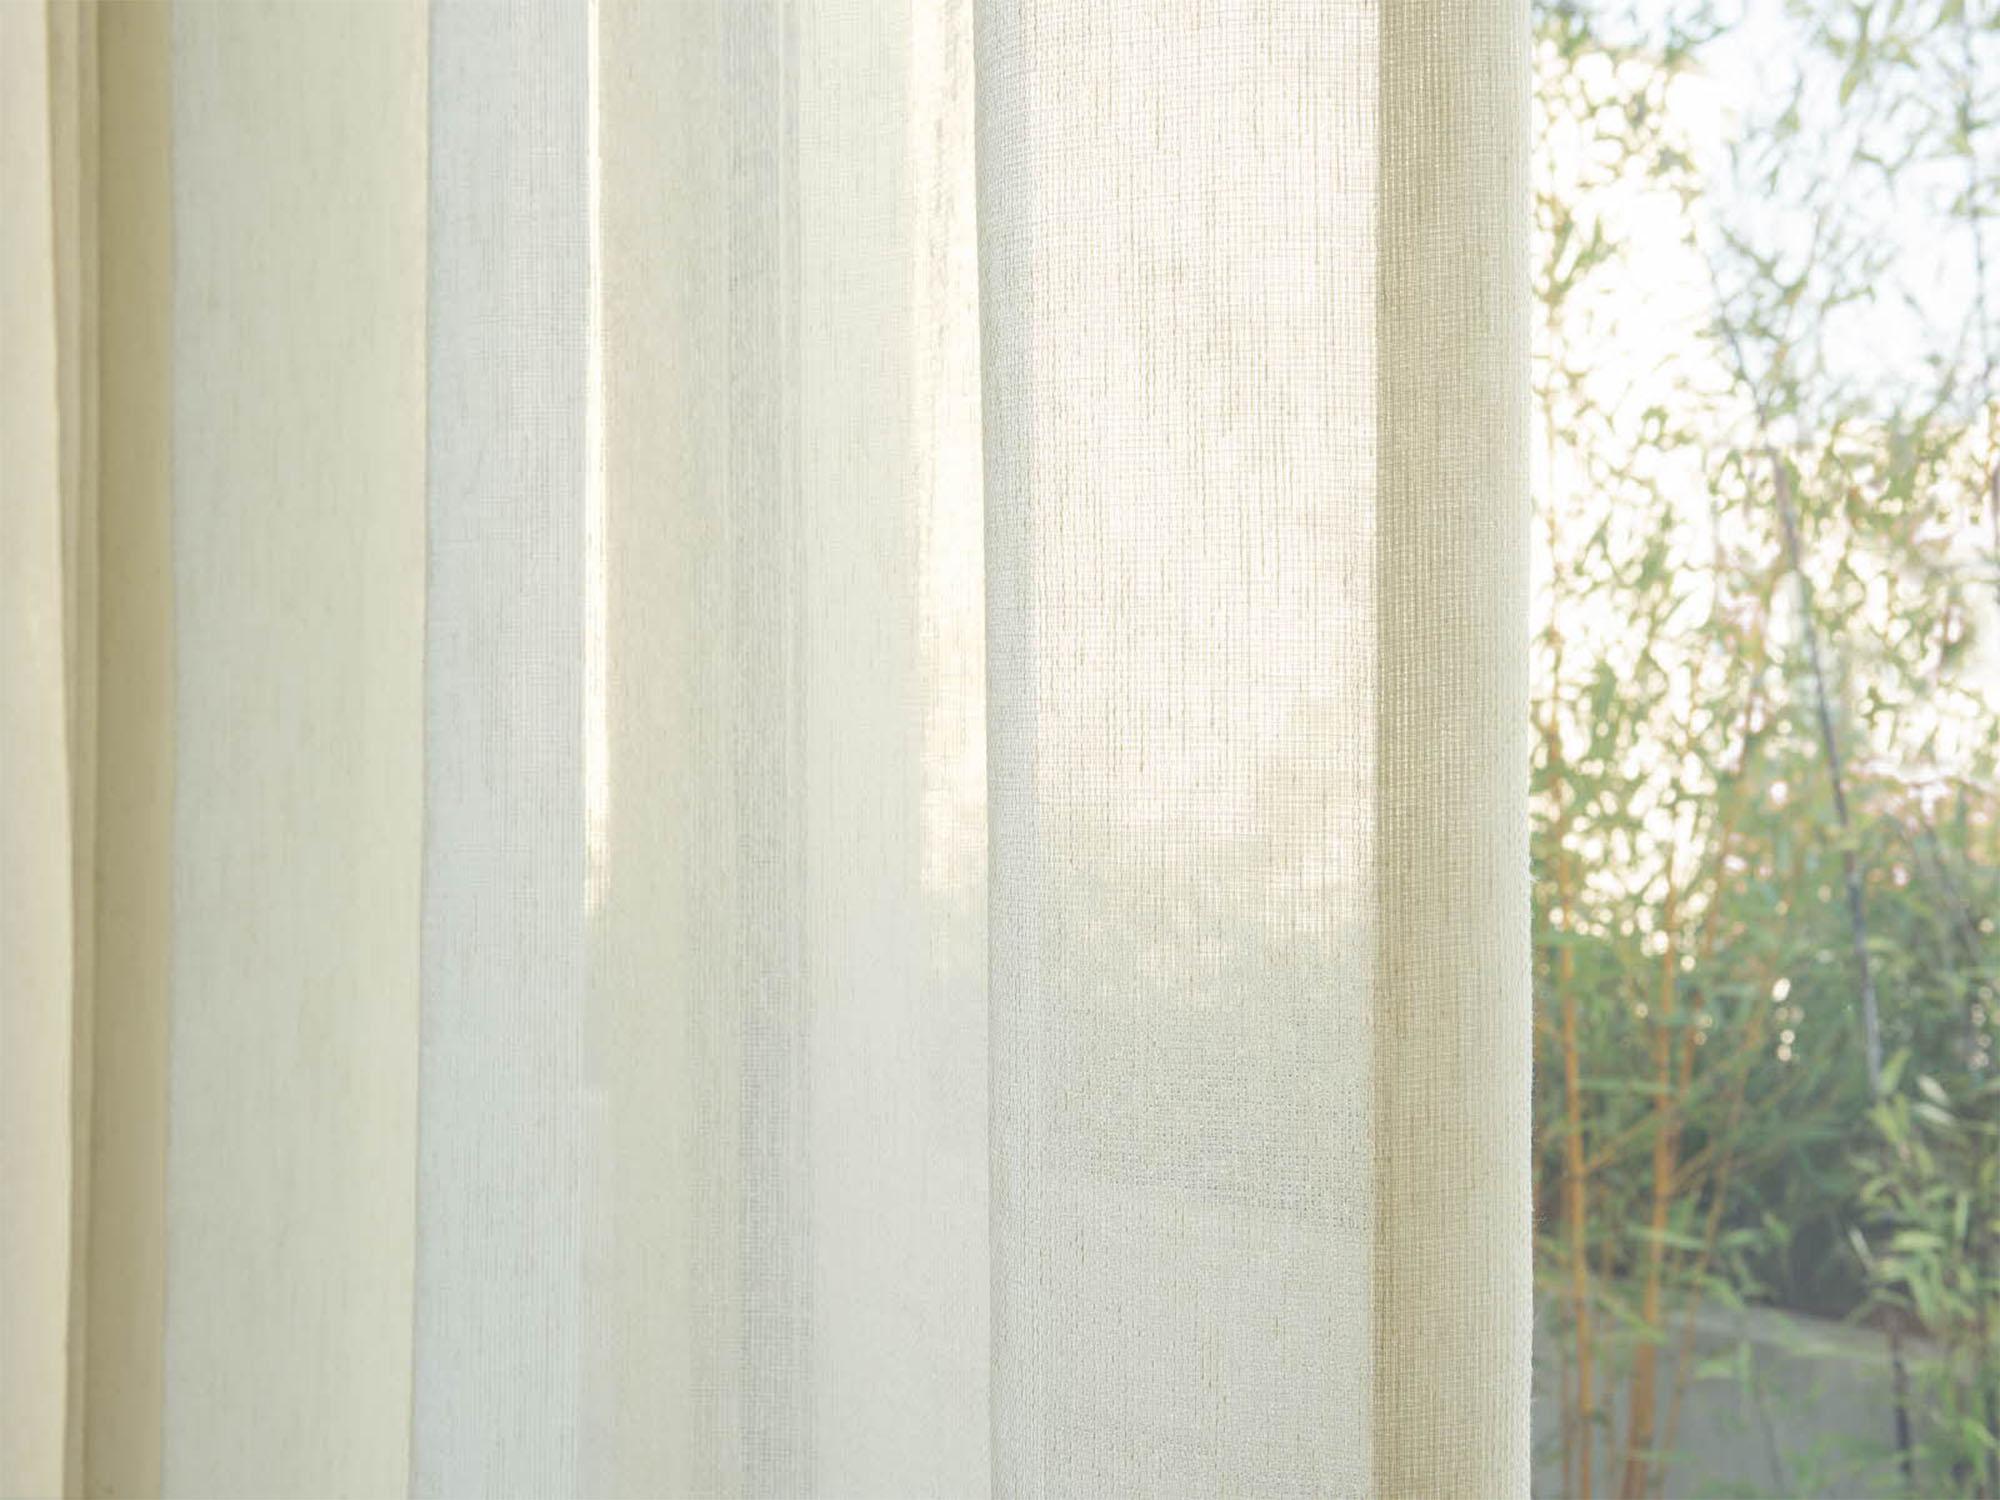 curtains_0002_Unity_004